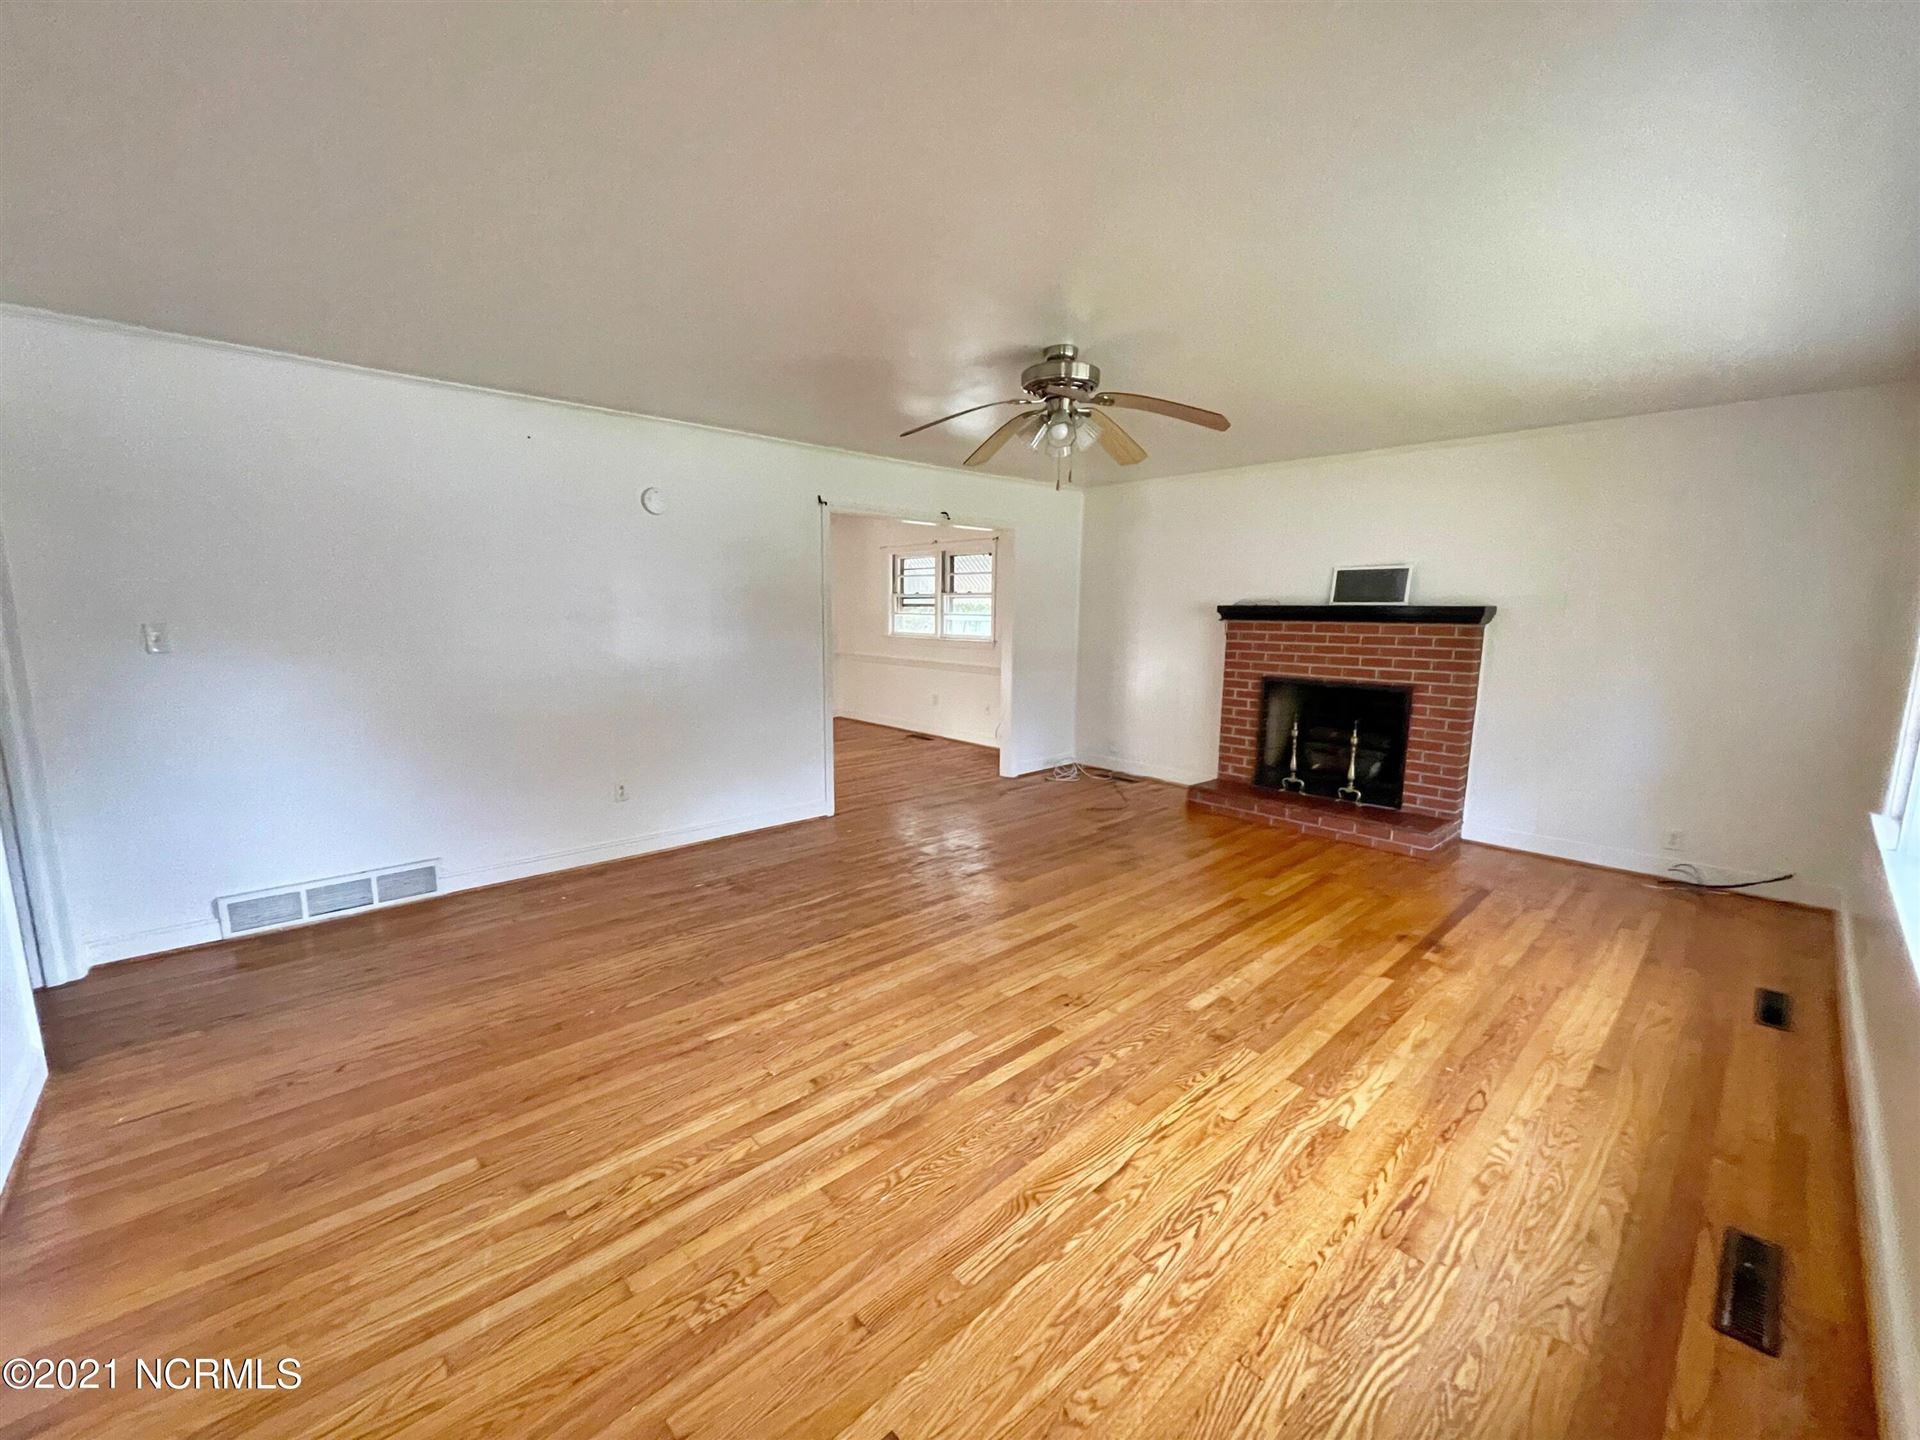 Photo of 2303 Woodland Avenue, New Bern, NC 28562 (MLS # 100295387)